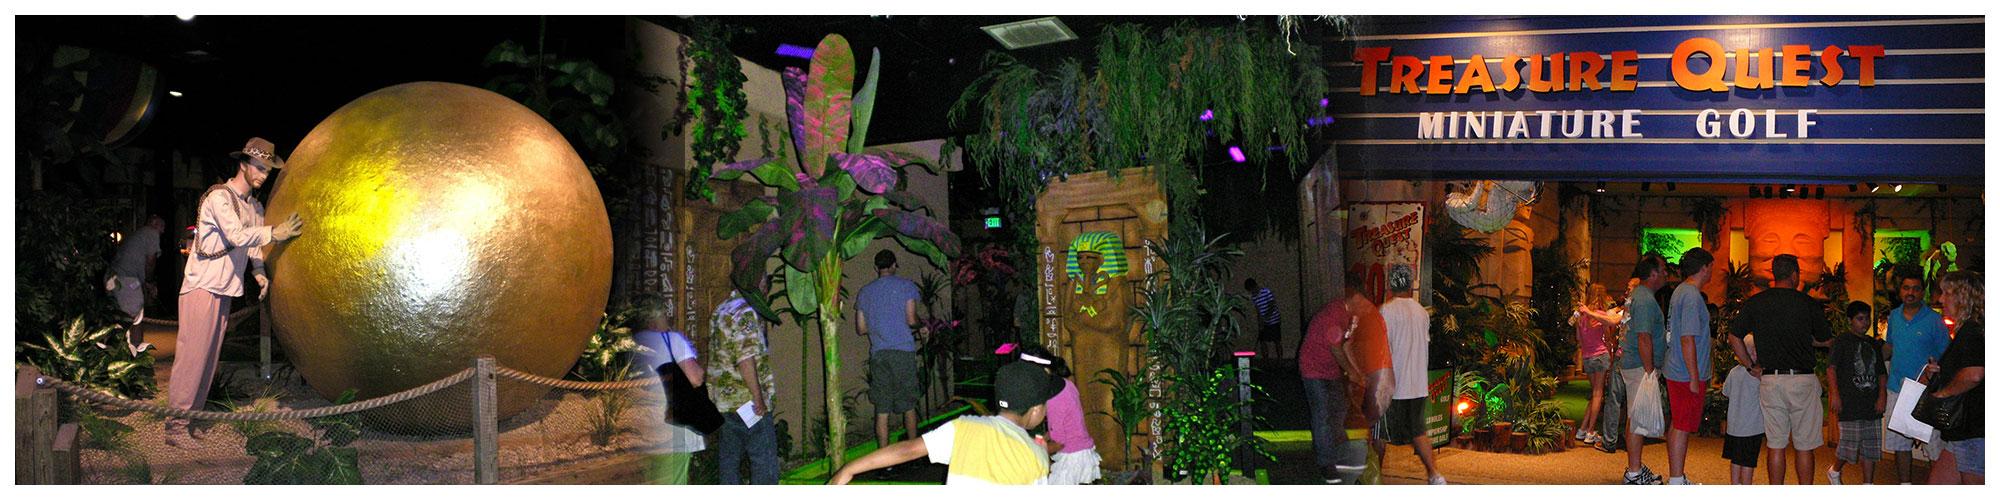 Treasure Quest Golf (Header Background) | Gatlinburg Attractions